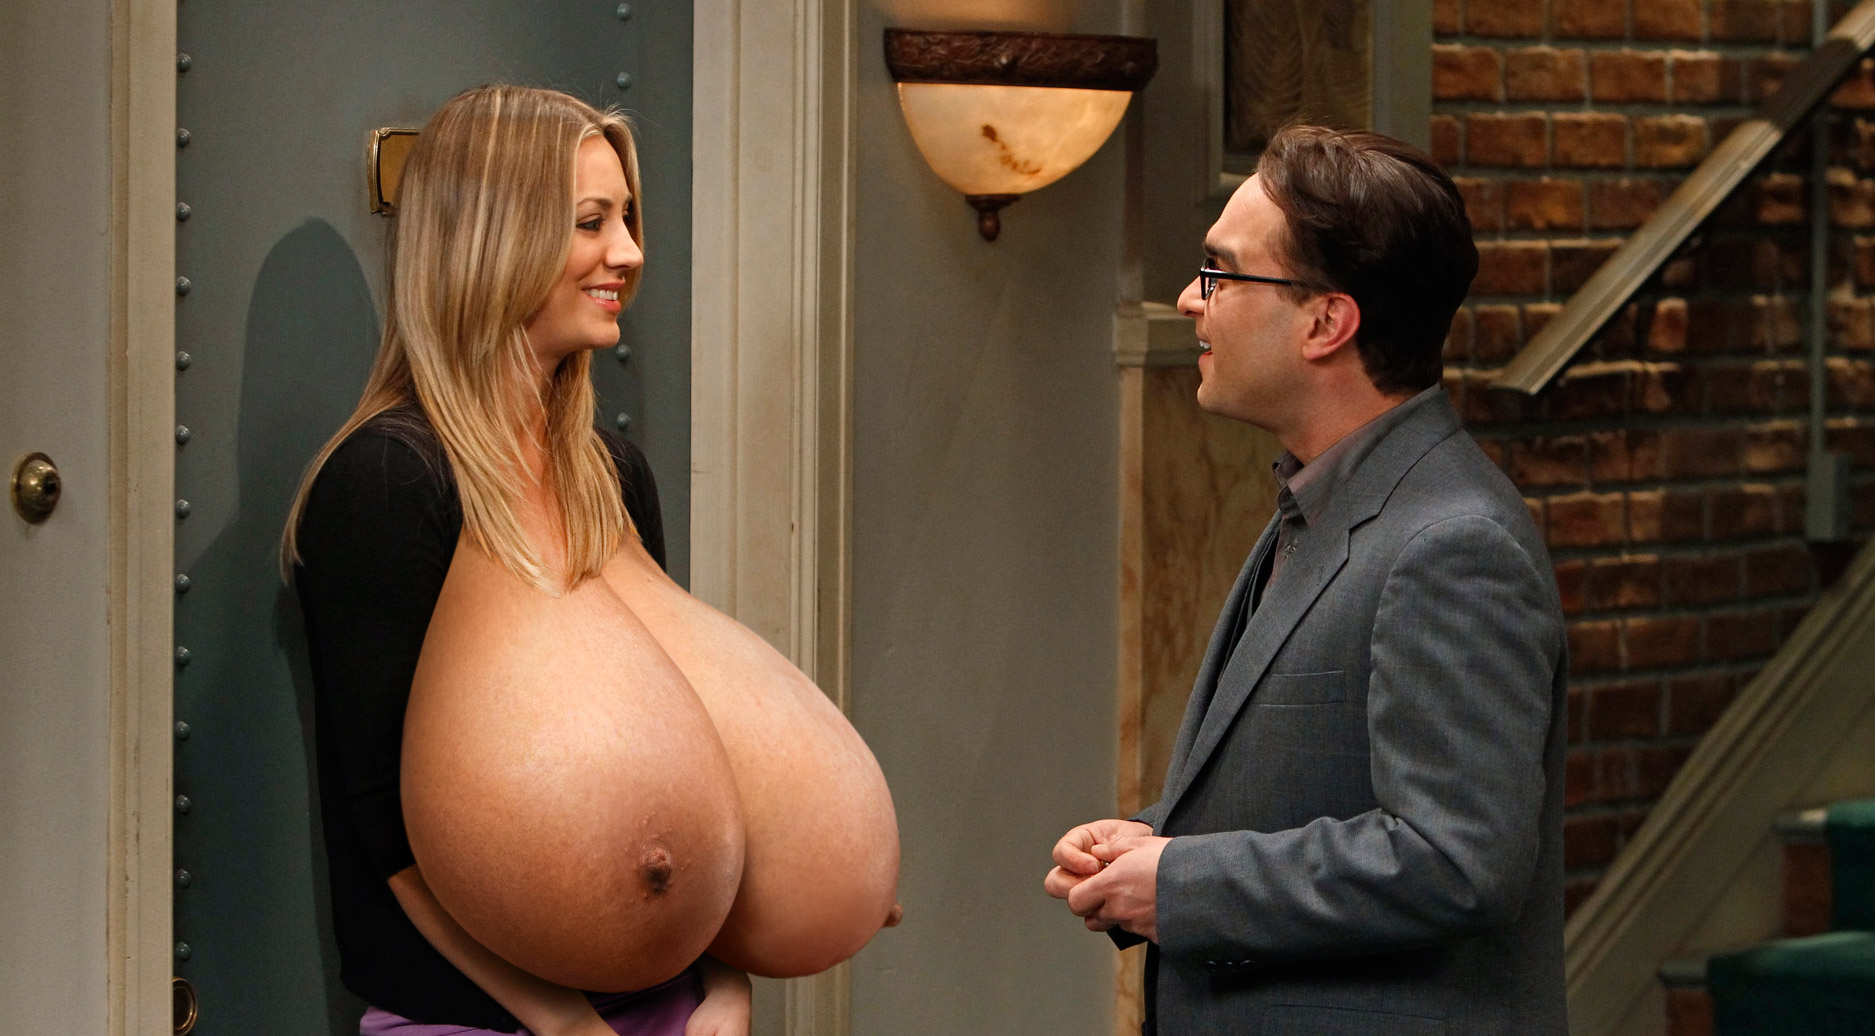 Big tits cuoco kaley Nude Kaley